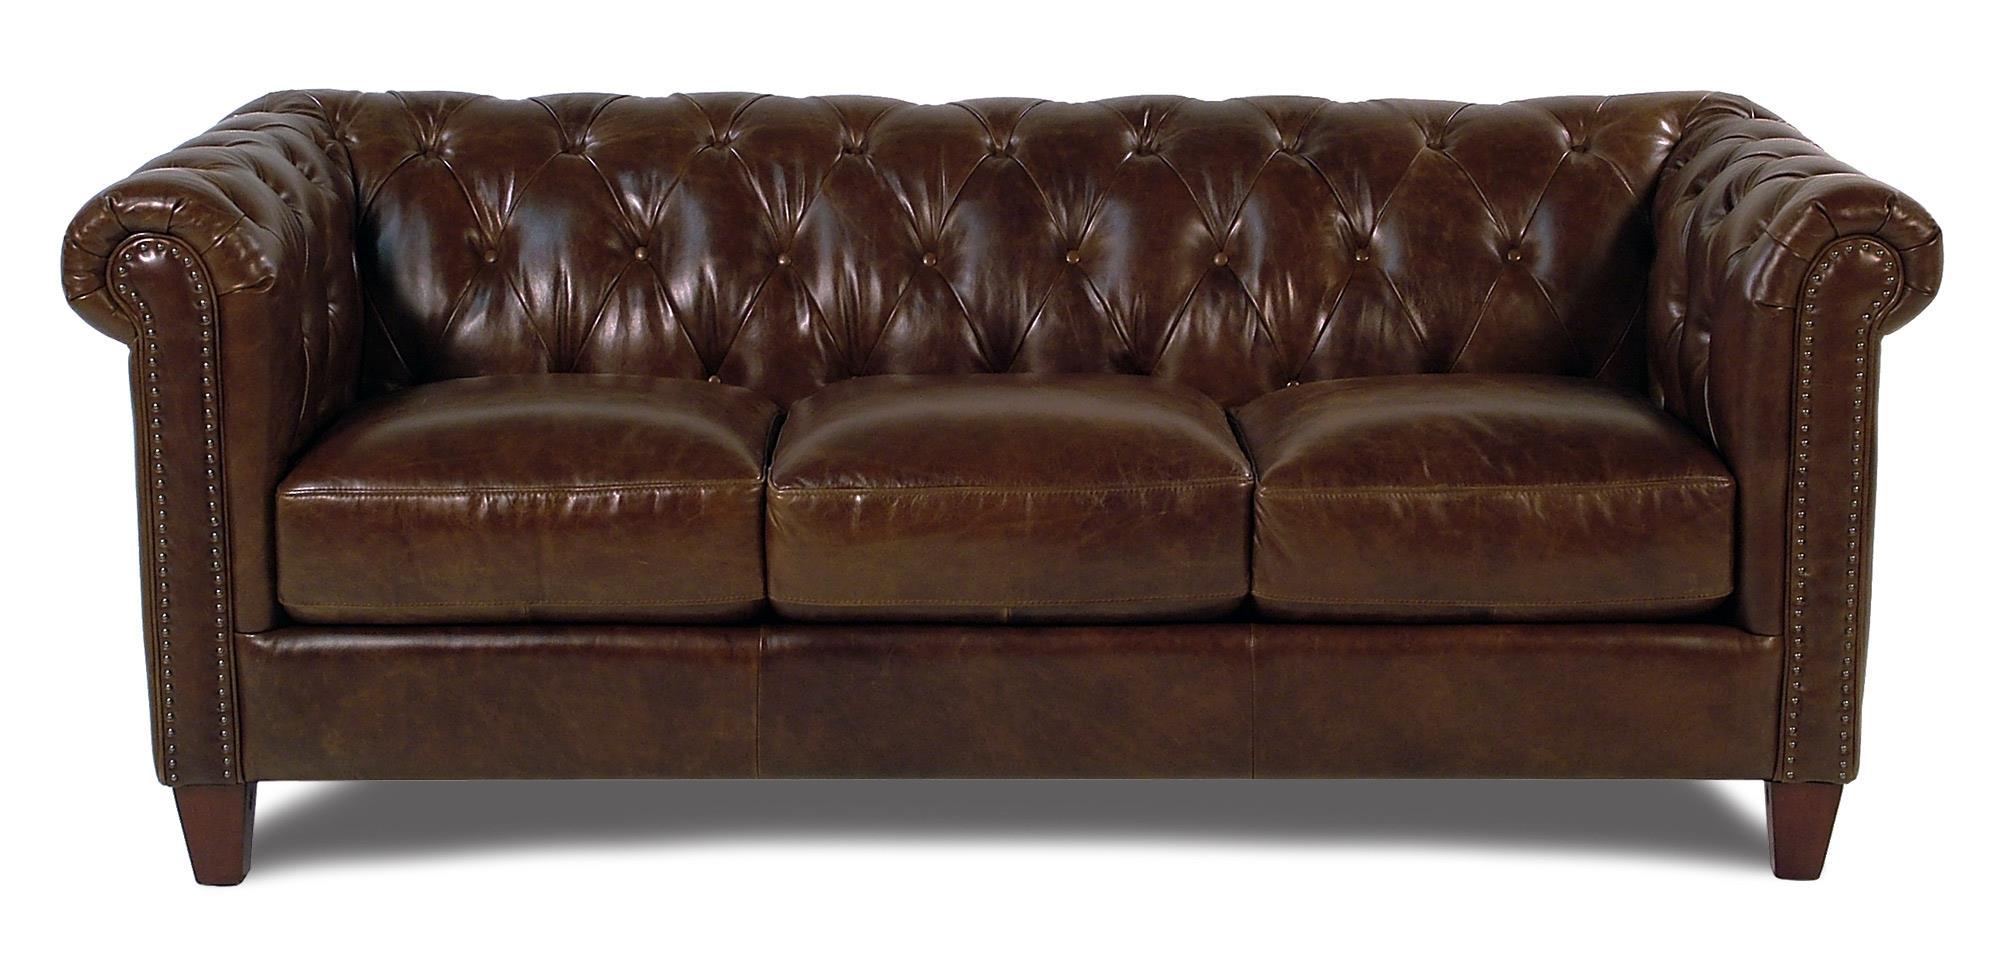 Loft Leather Carrington Tufted Leather Sofa - Item Number: 8687-30